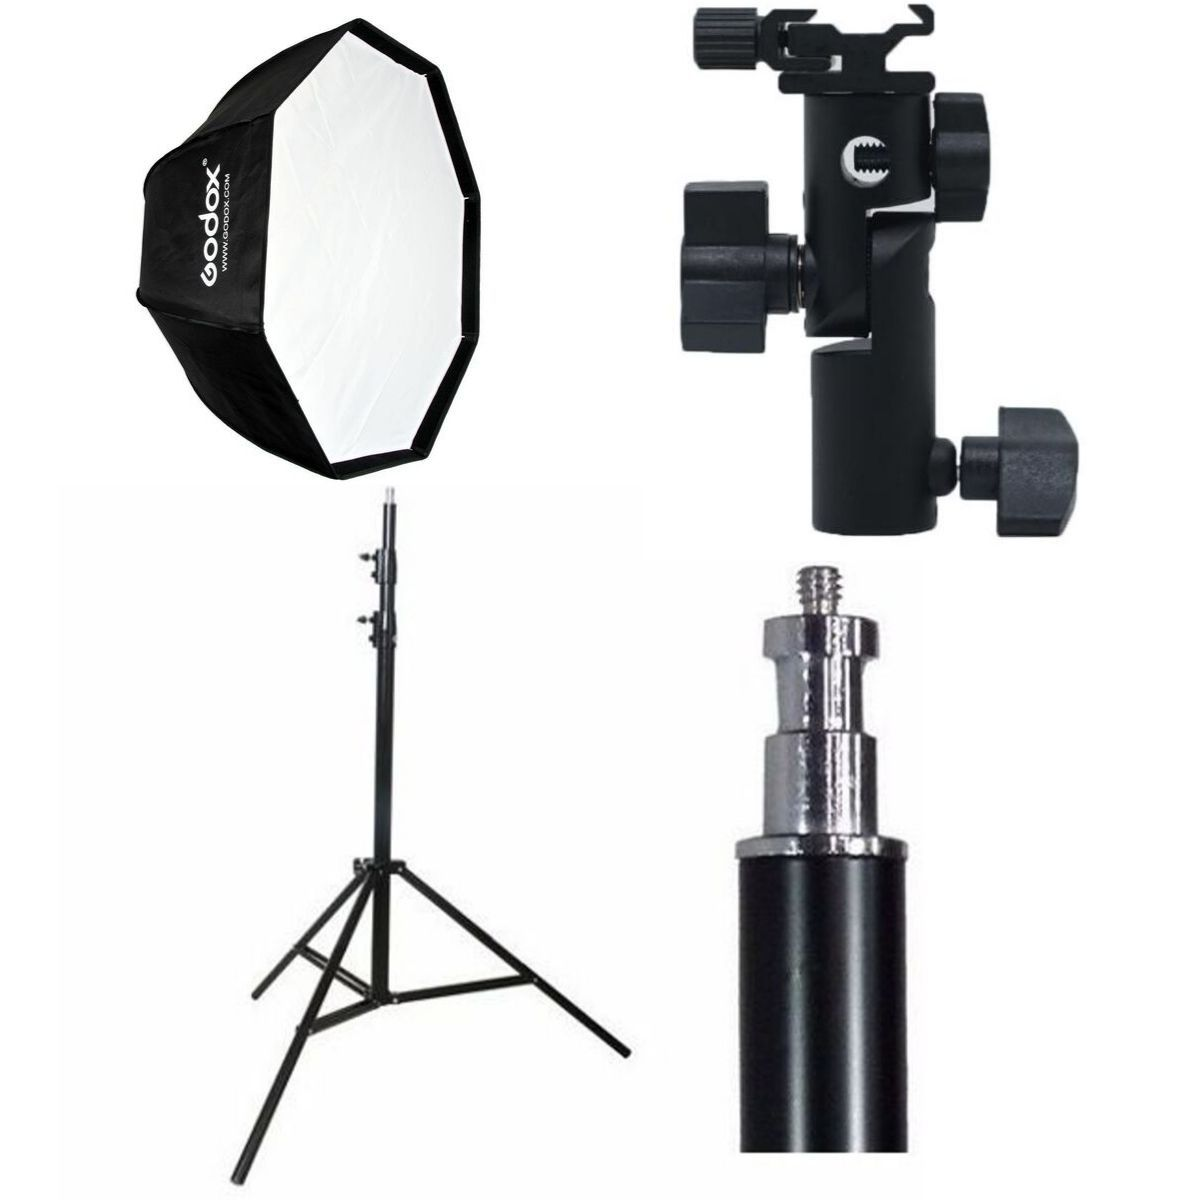 Kit Fotográfico Softbox Octabox Profissional Para Estúdio 80cm + Tripé 2M St-803 + Suporte Adaptador